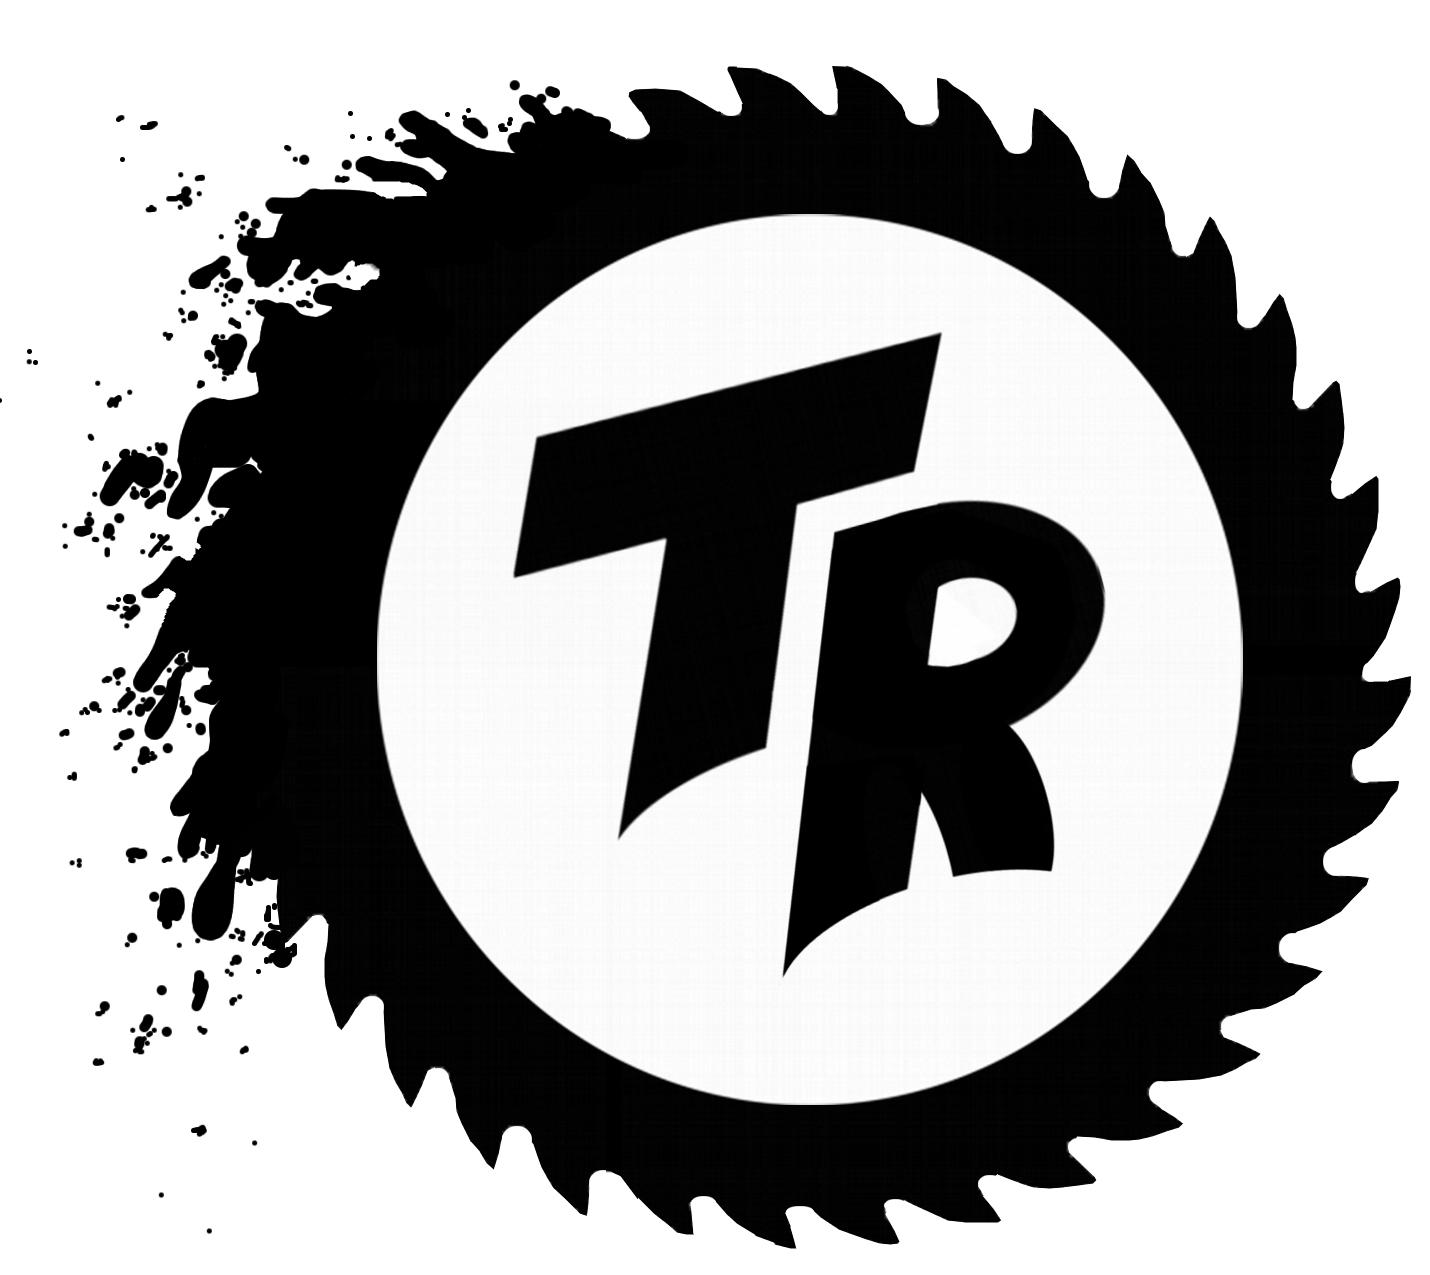 Tr Logos